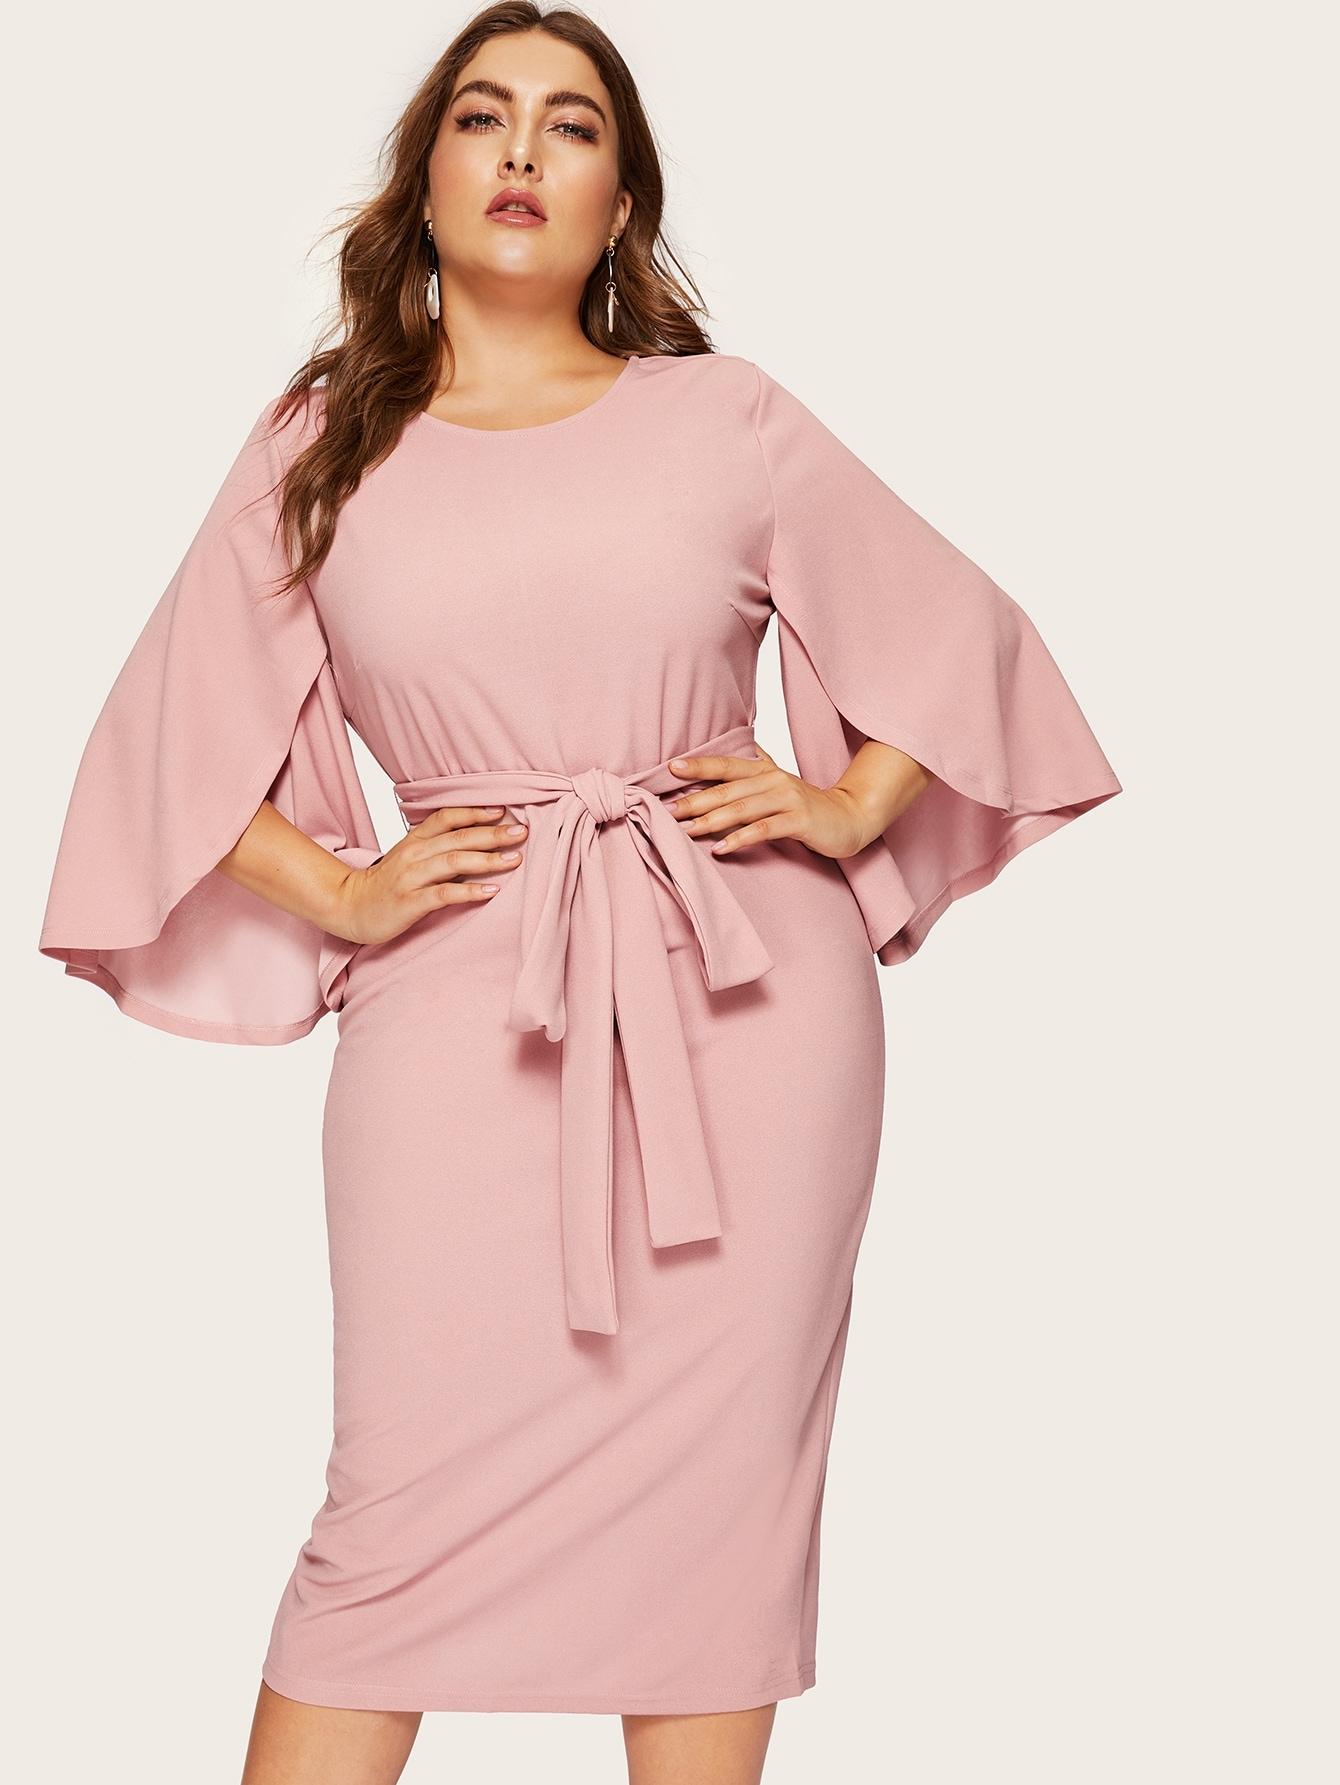 Размер плюс платье-карандаш с разрезом на рукавах